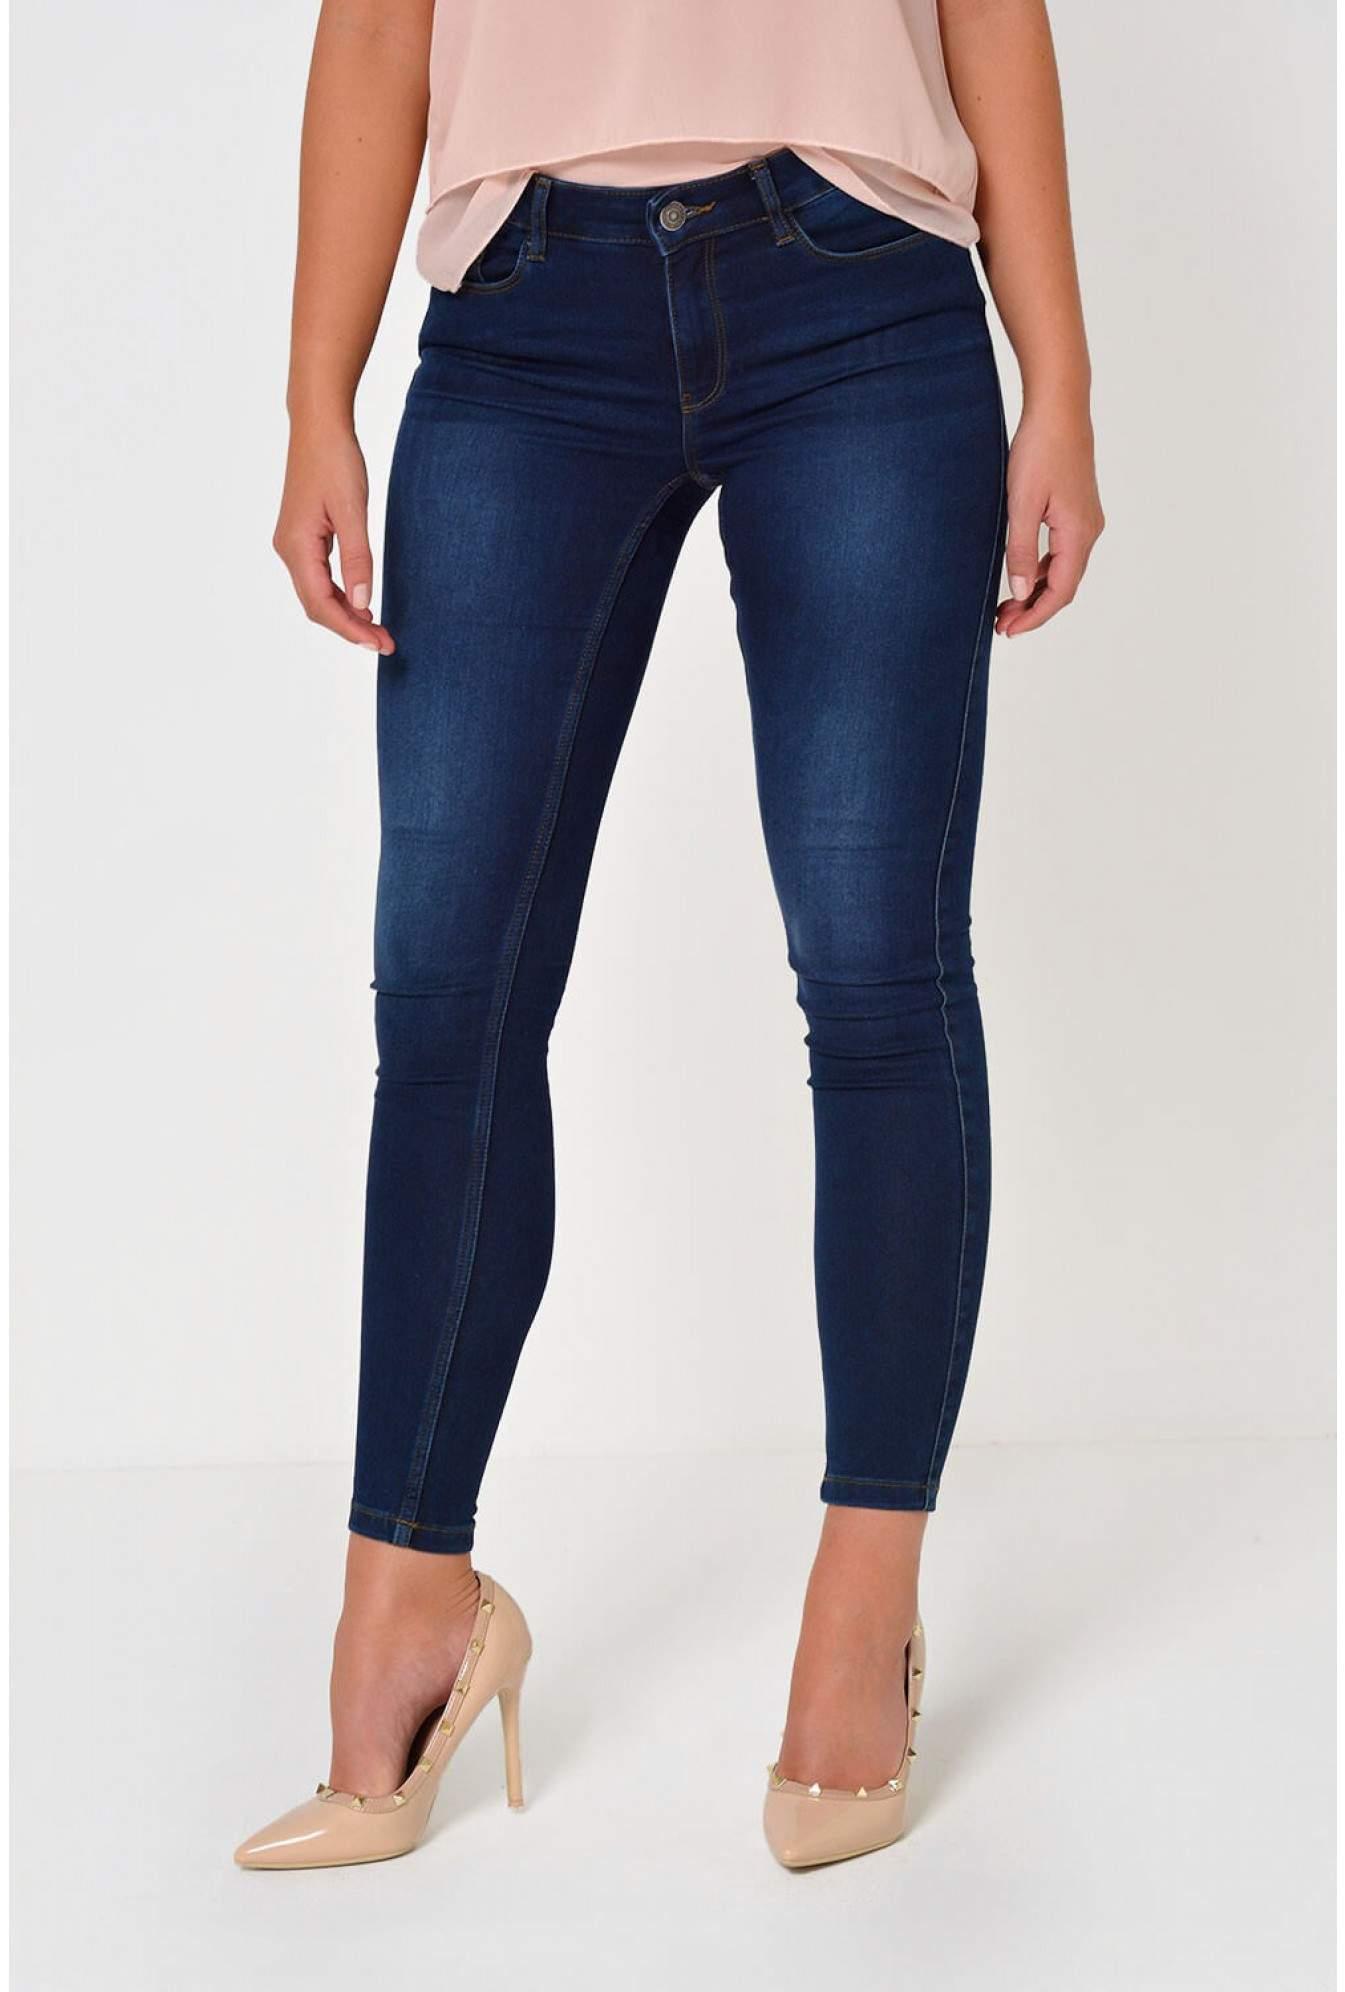 More Views. Seven Long Shape up Jeans in Dark Blue. Vero Moda b008ba7c7